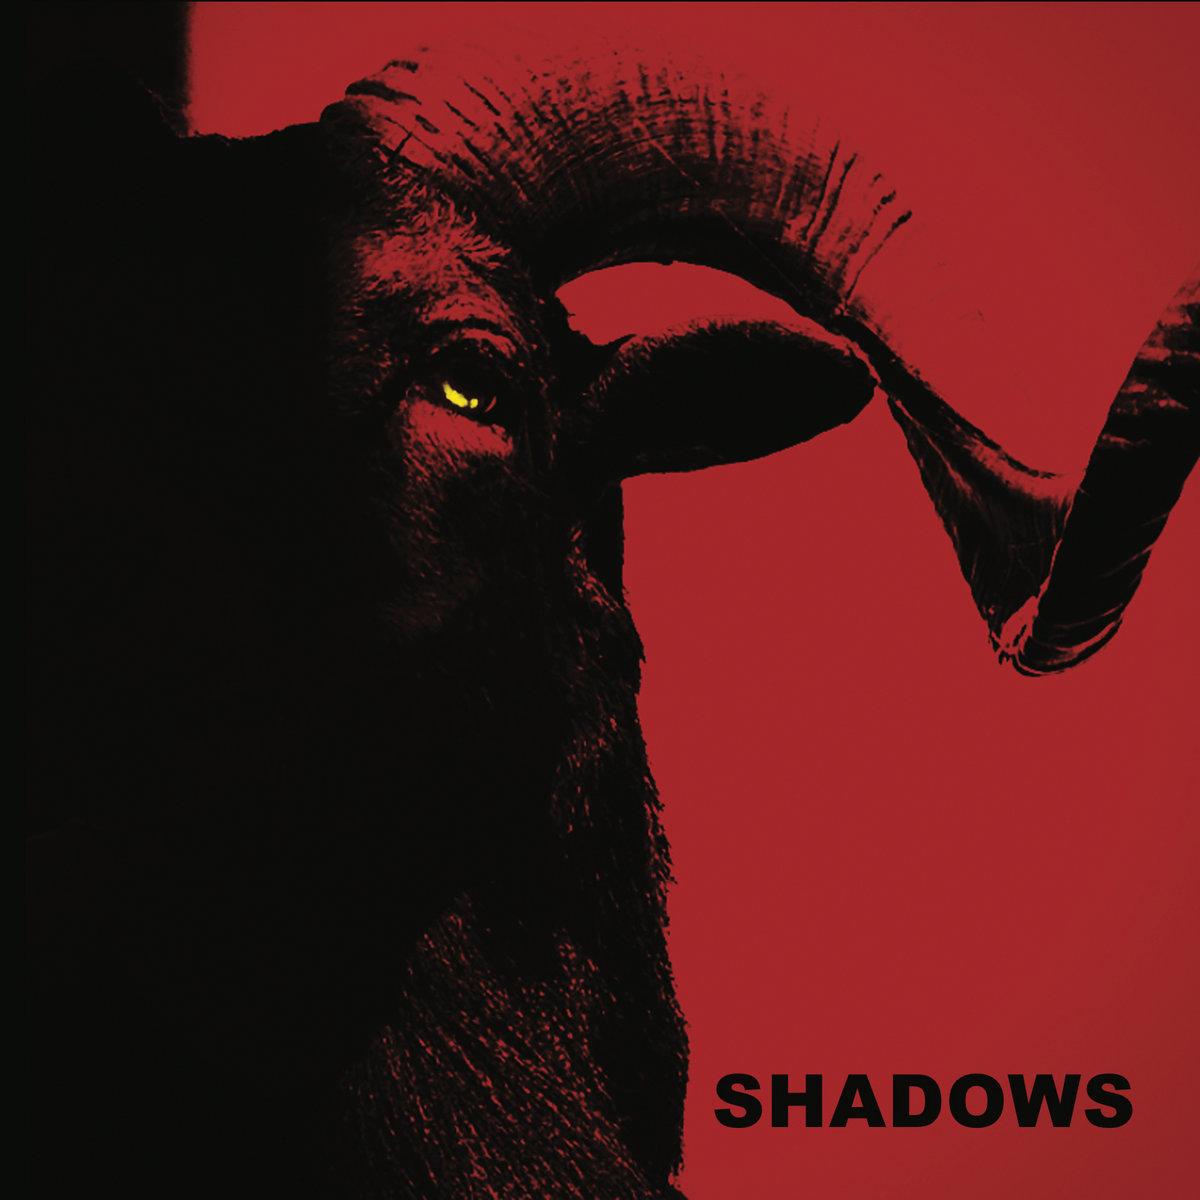 Shadows – Shadows (2021) [FLAC]